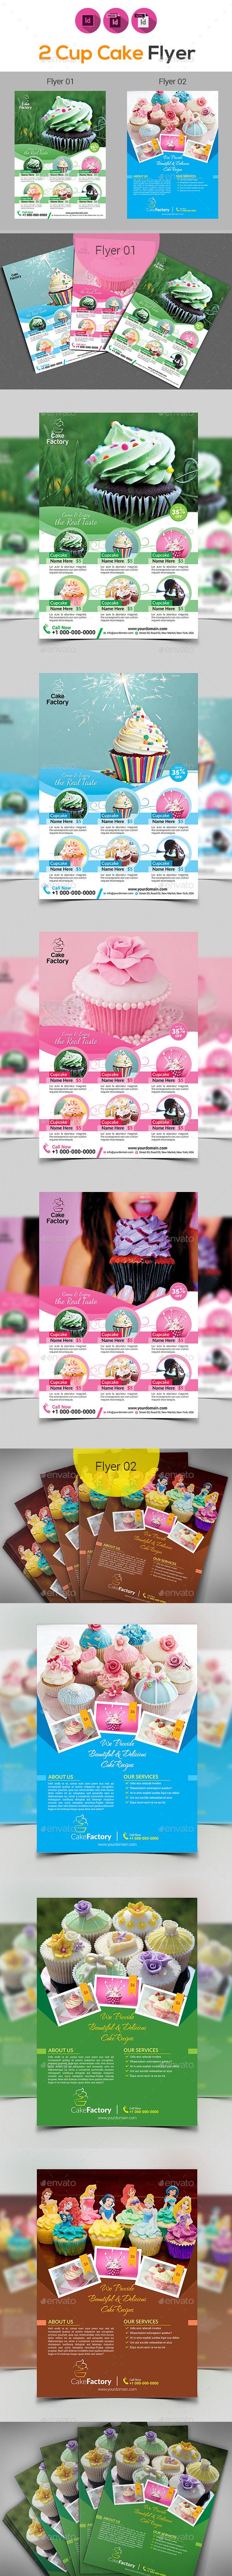 Cake Shop Flyer Bundle - Restaurant Flyers